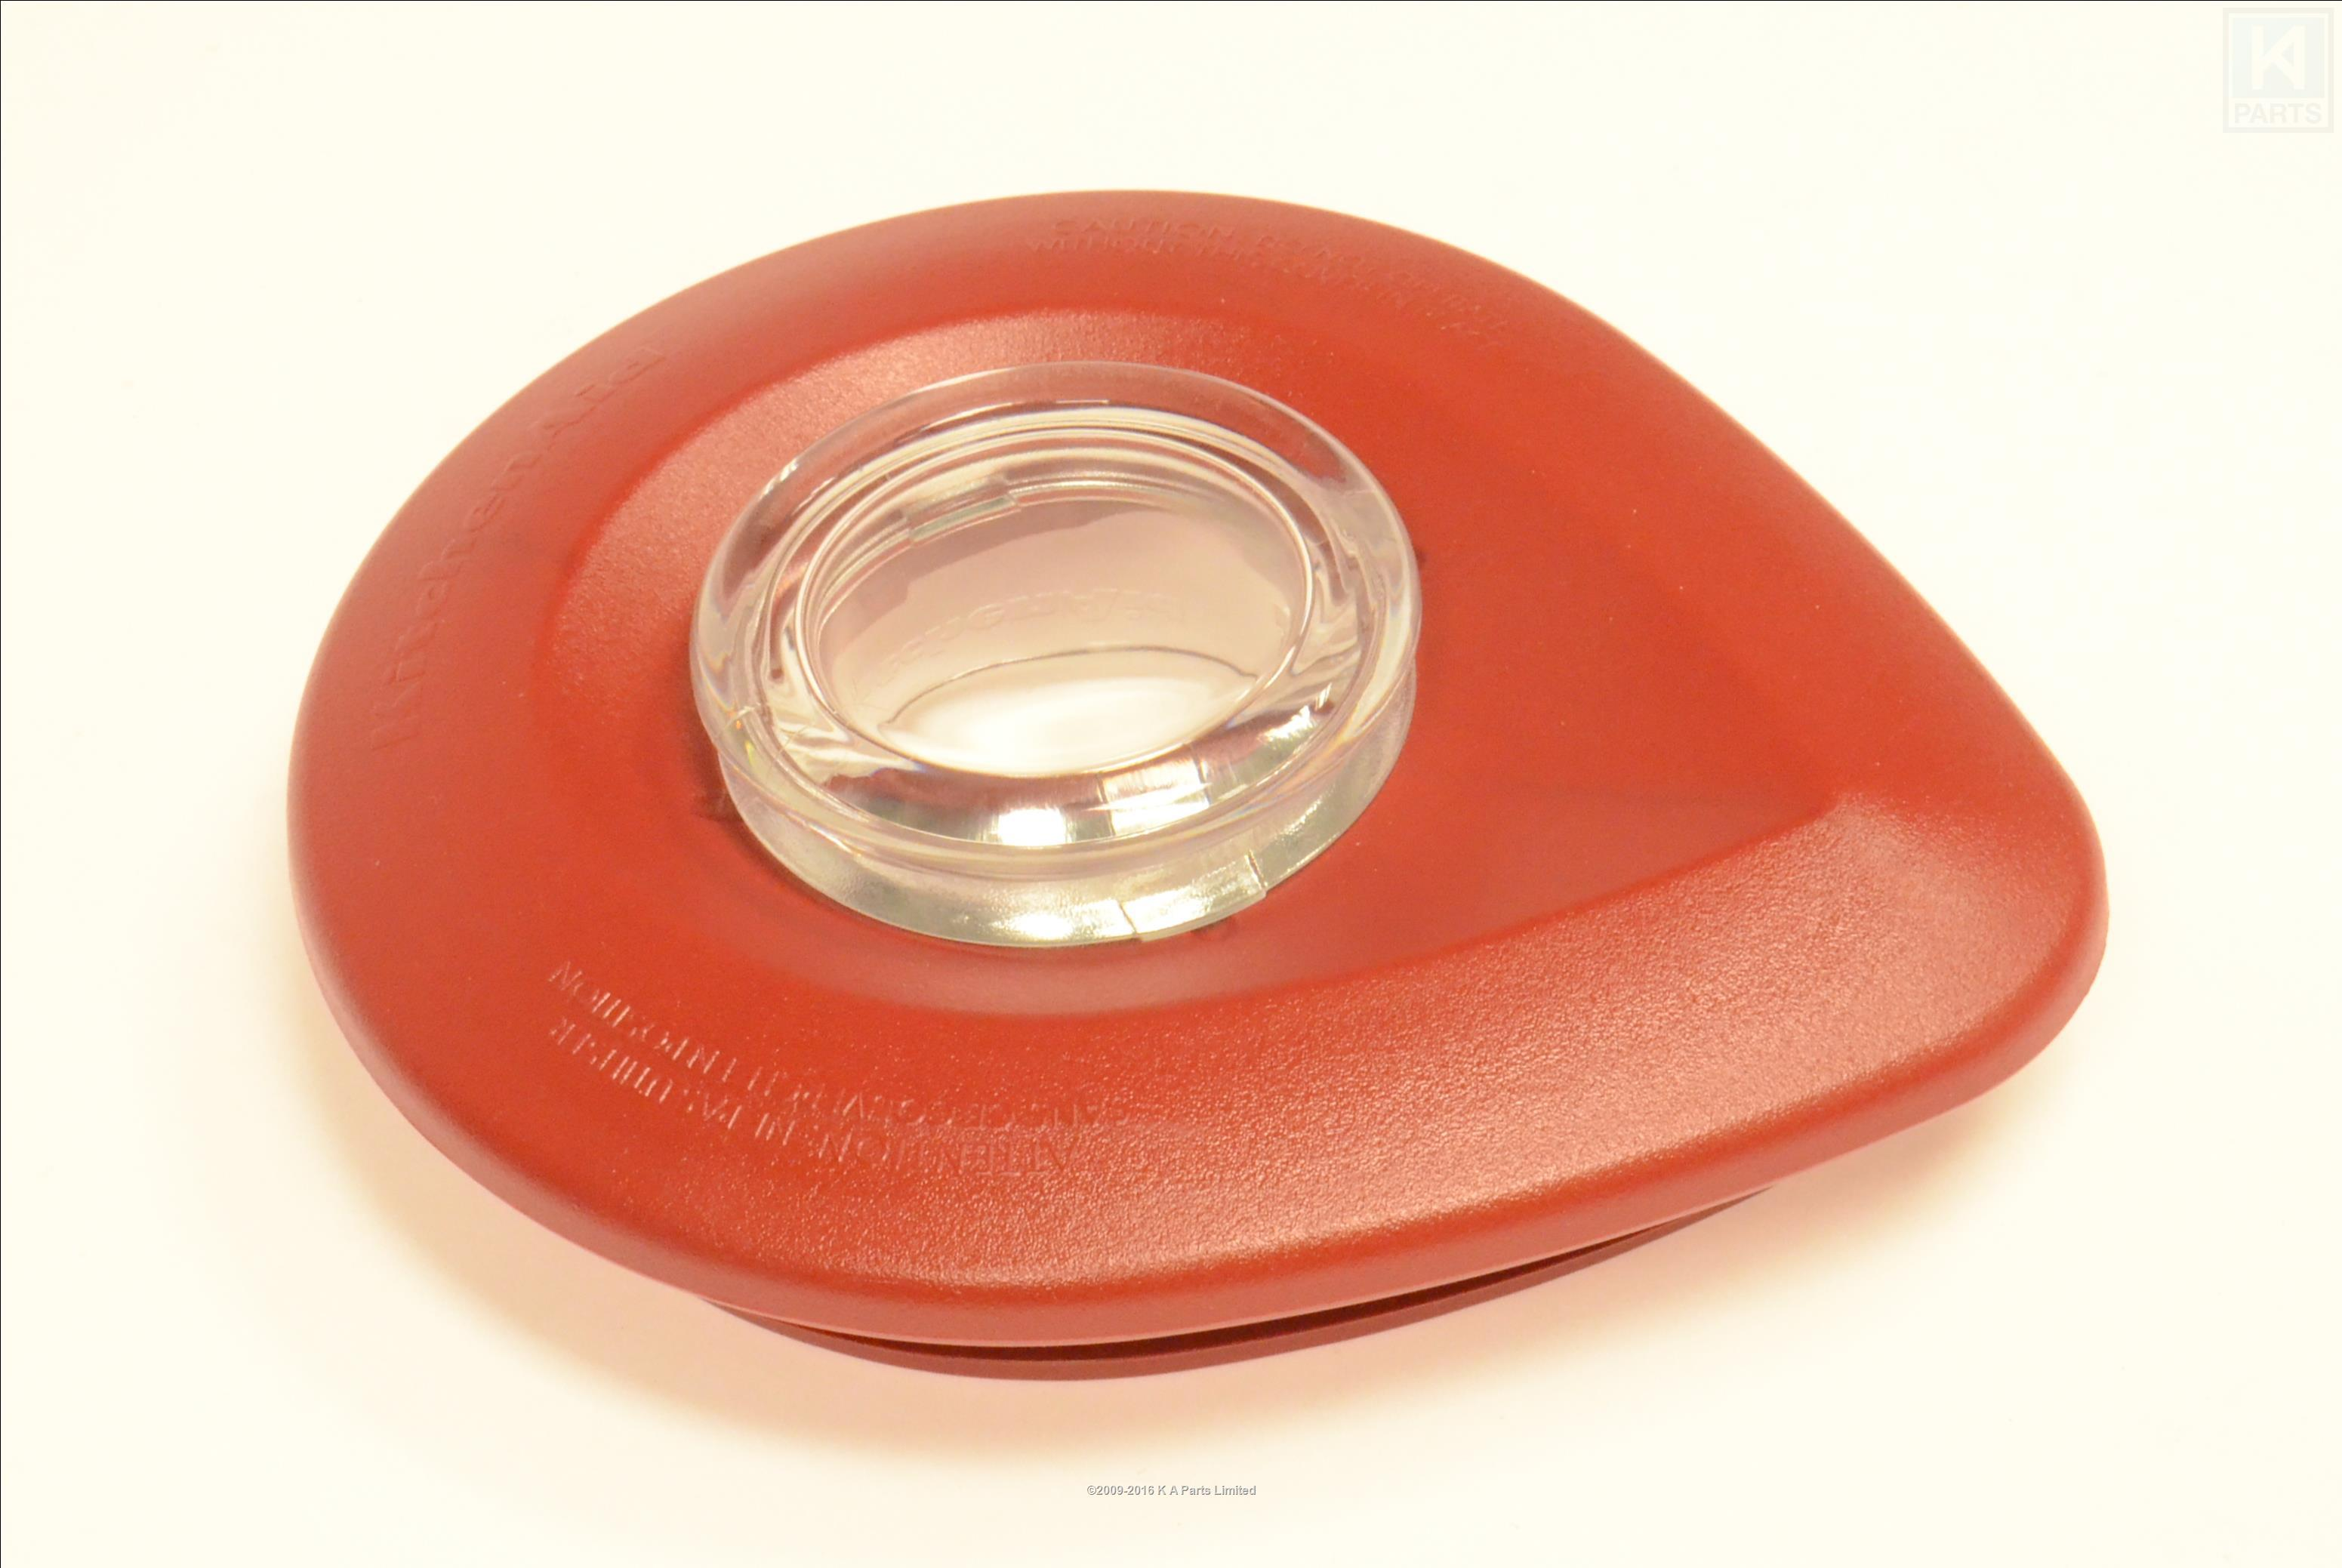 W10415985 kitchenaid blender lid red also w10236597 ebay - Kitchenaid blender parts uk ...